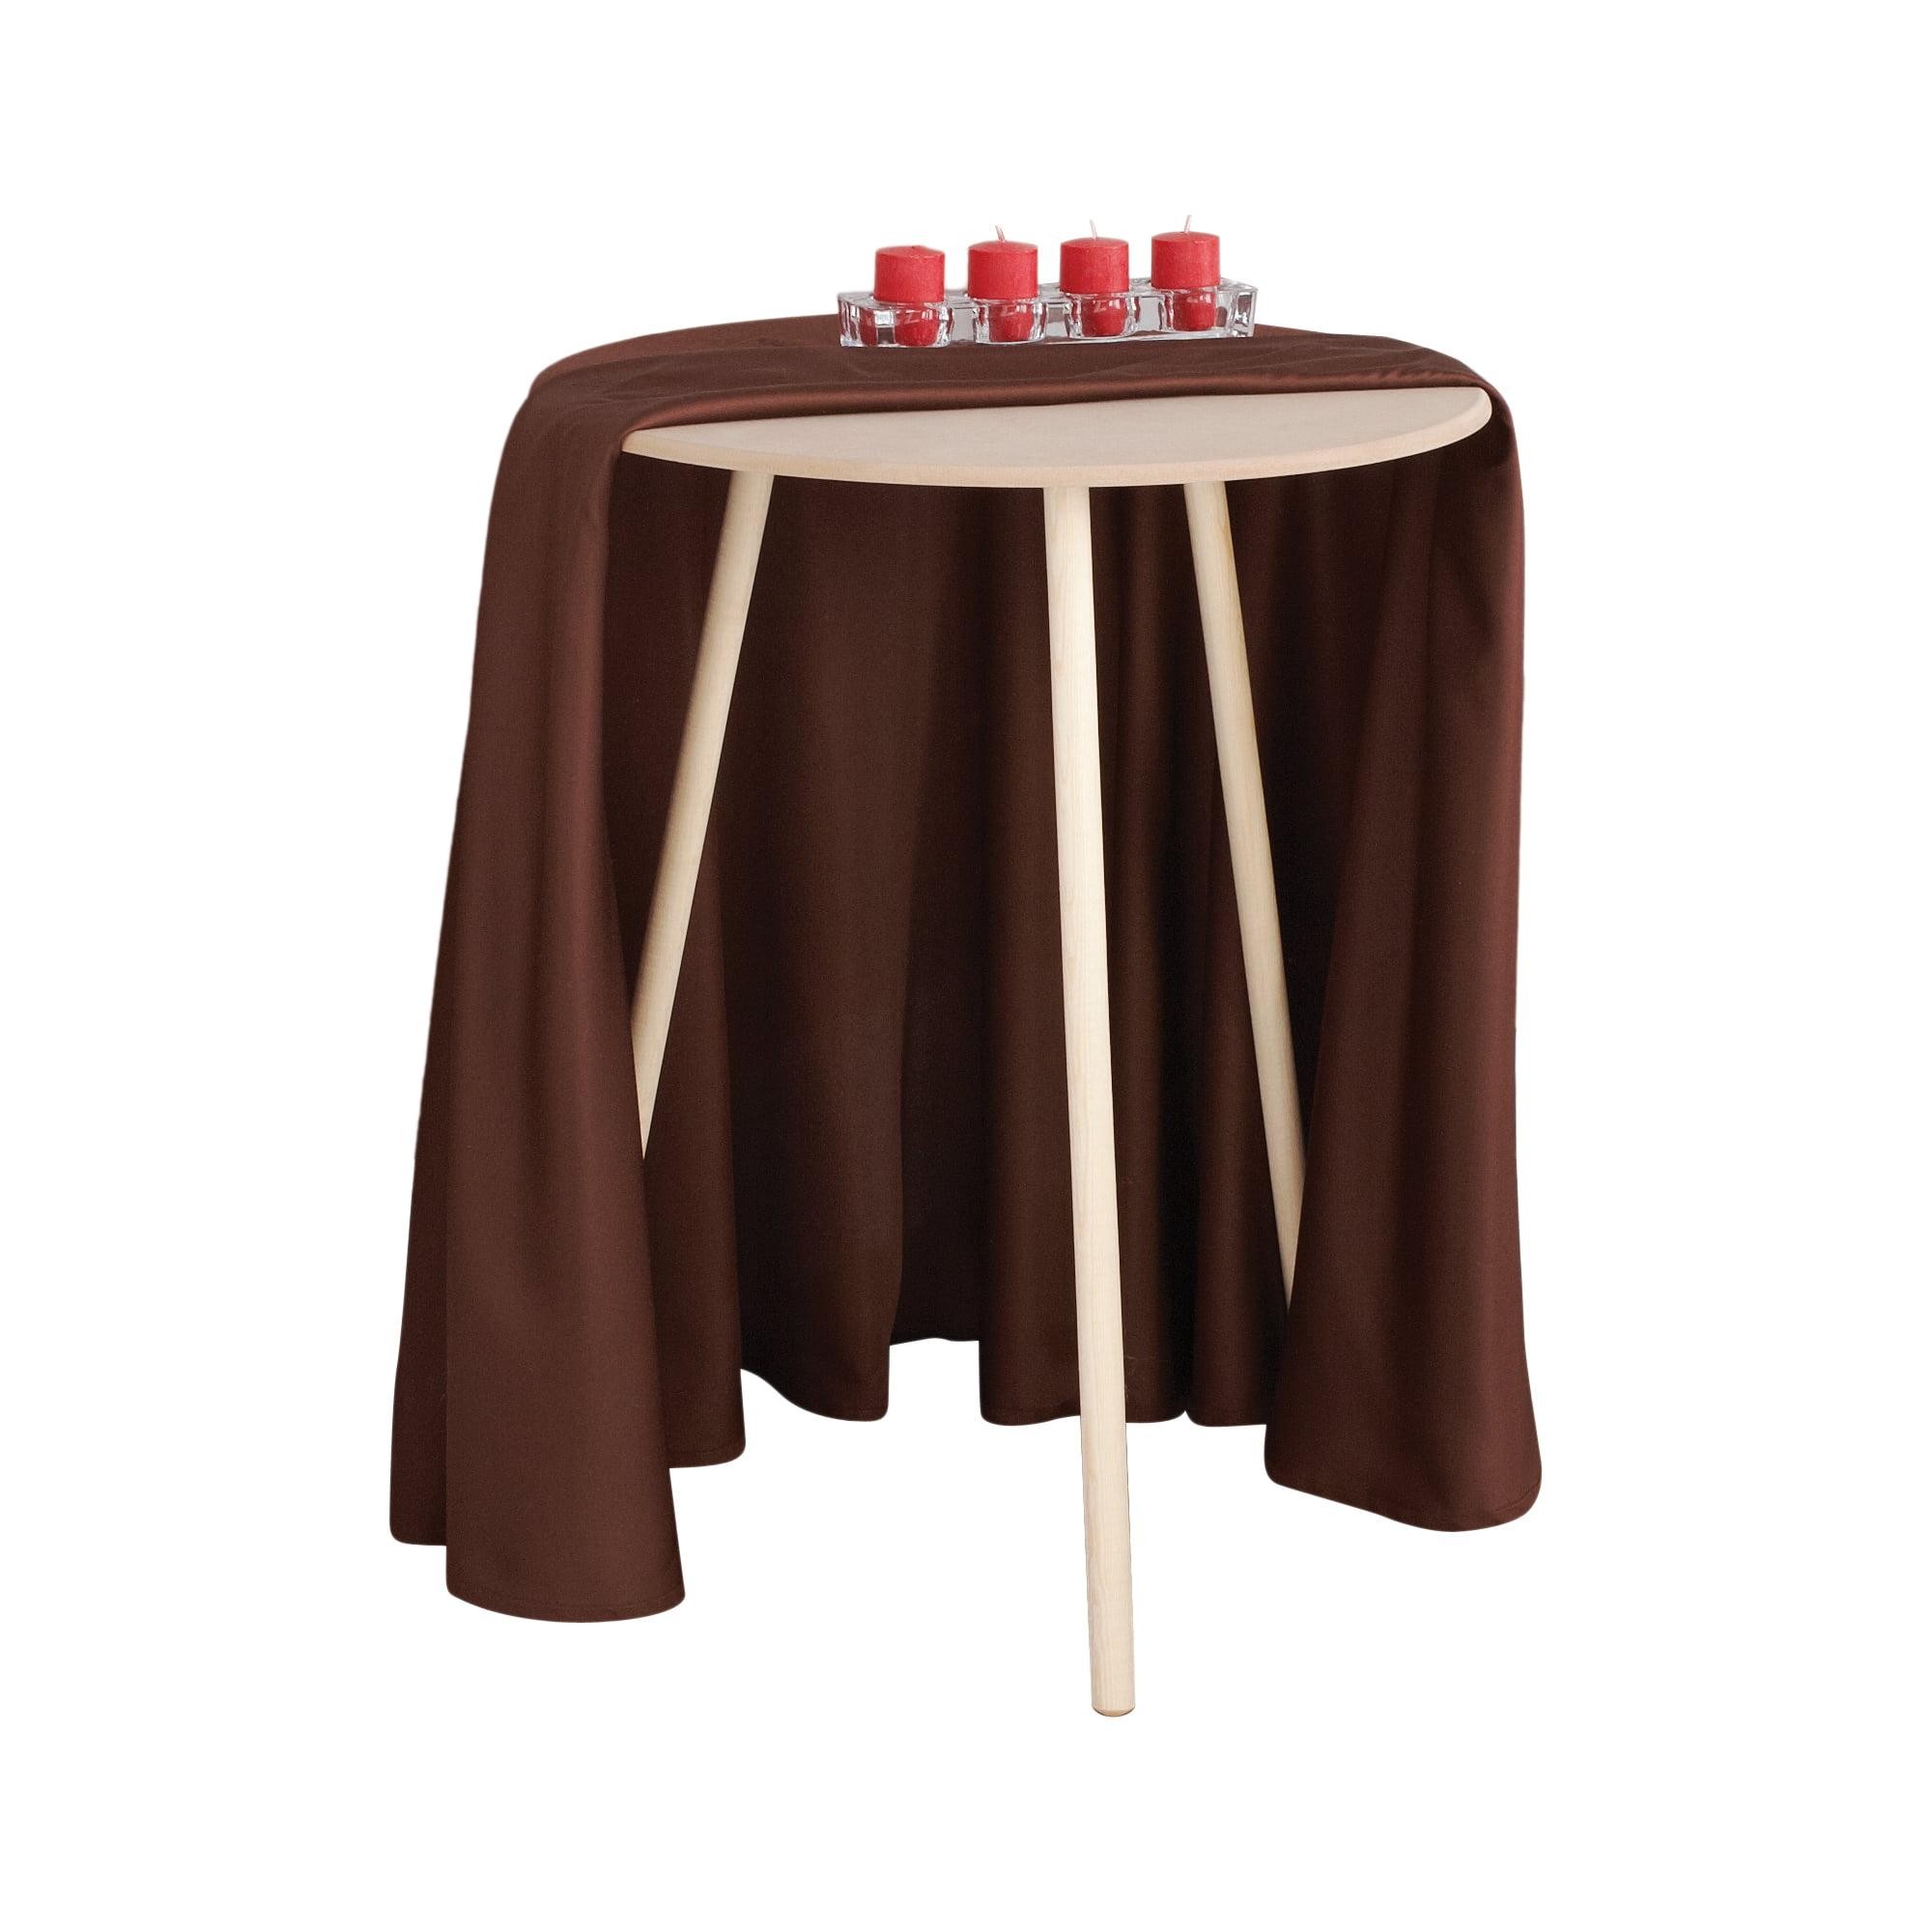 "Mainstays 20"" Round Decorative Table"